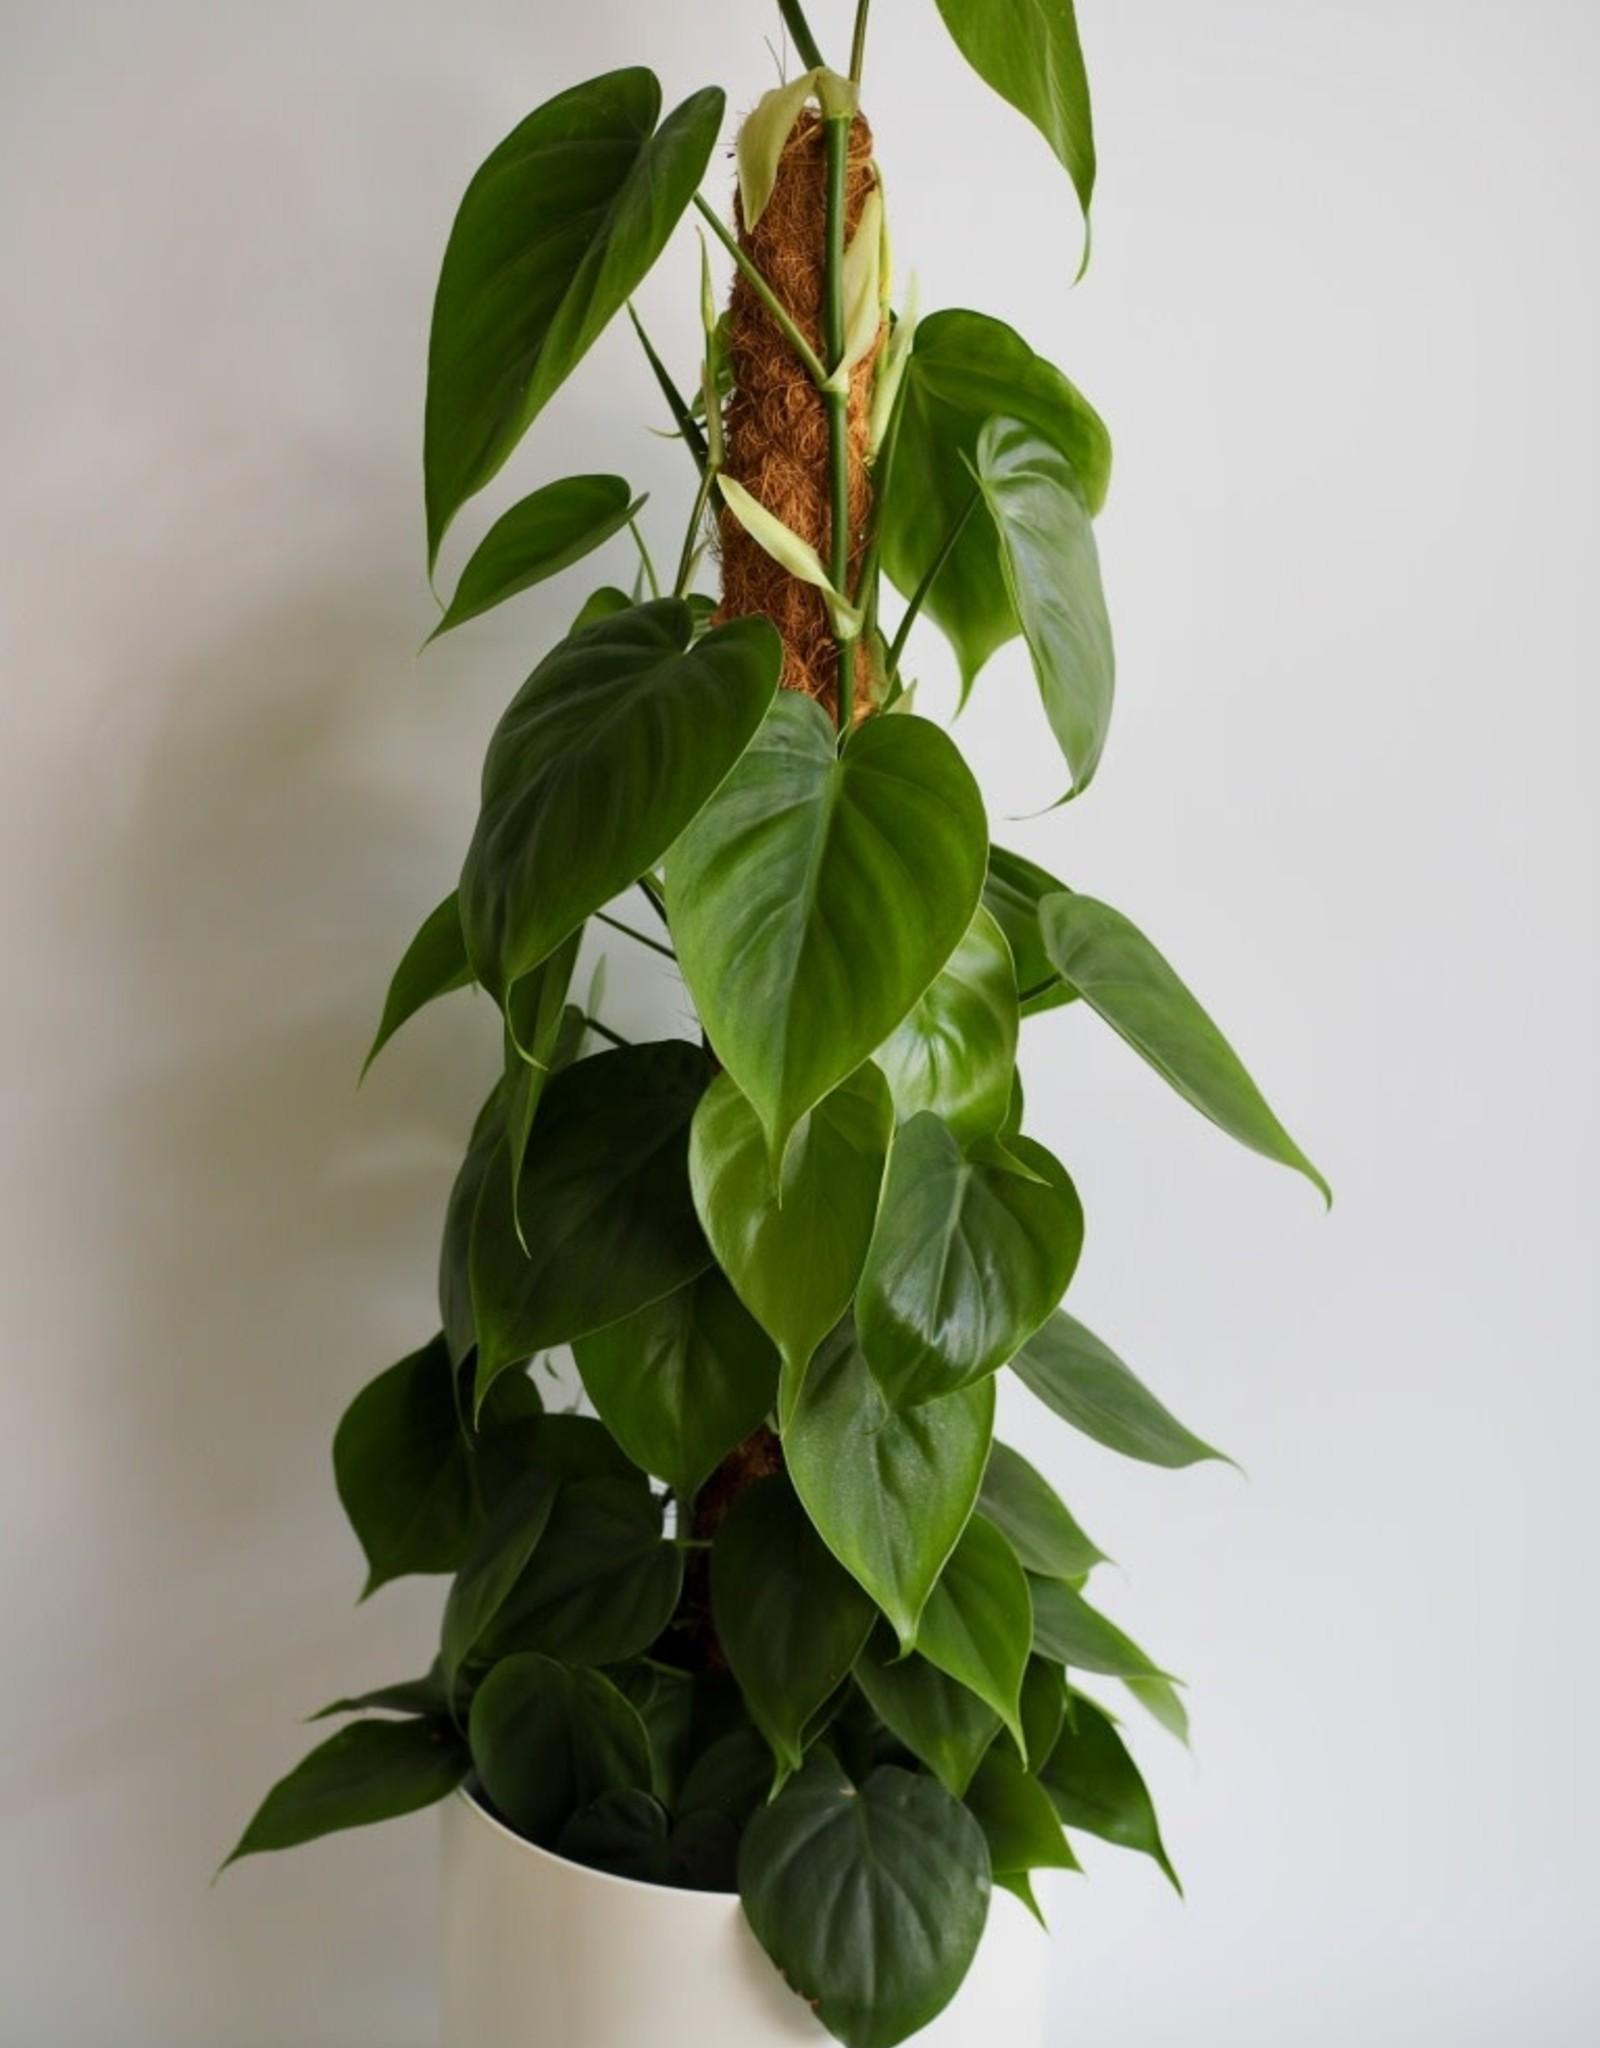 GRUUN Philodendron scandens Ø19 h80cm (moss pole)